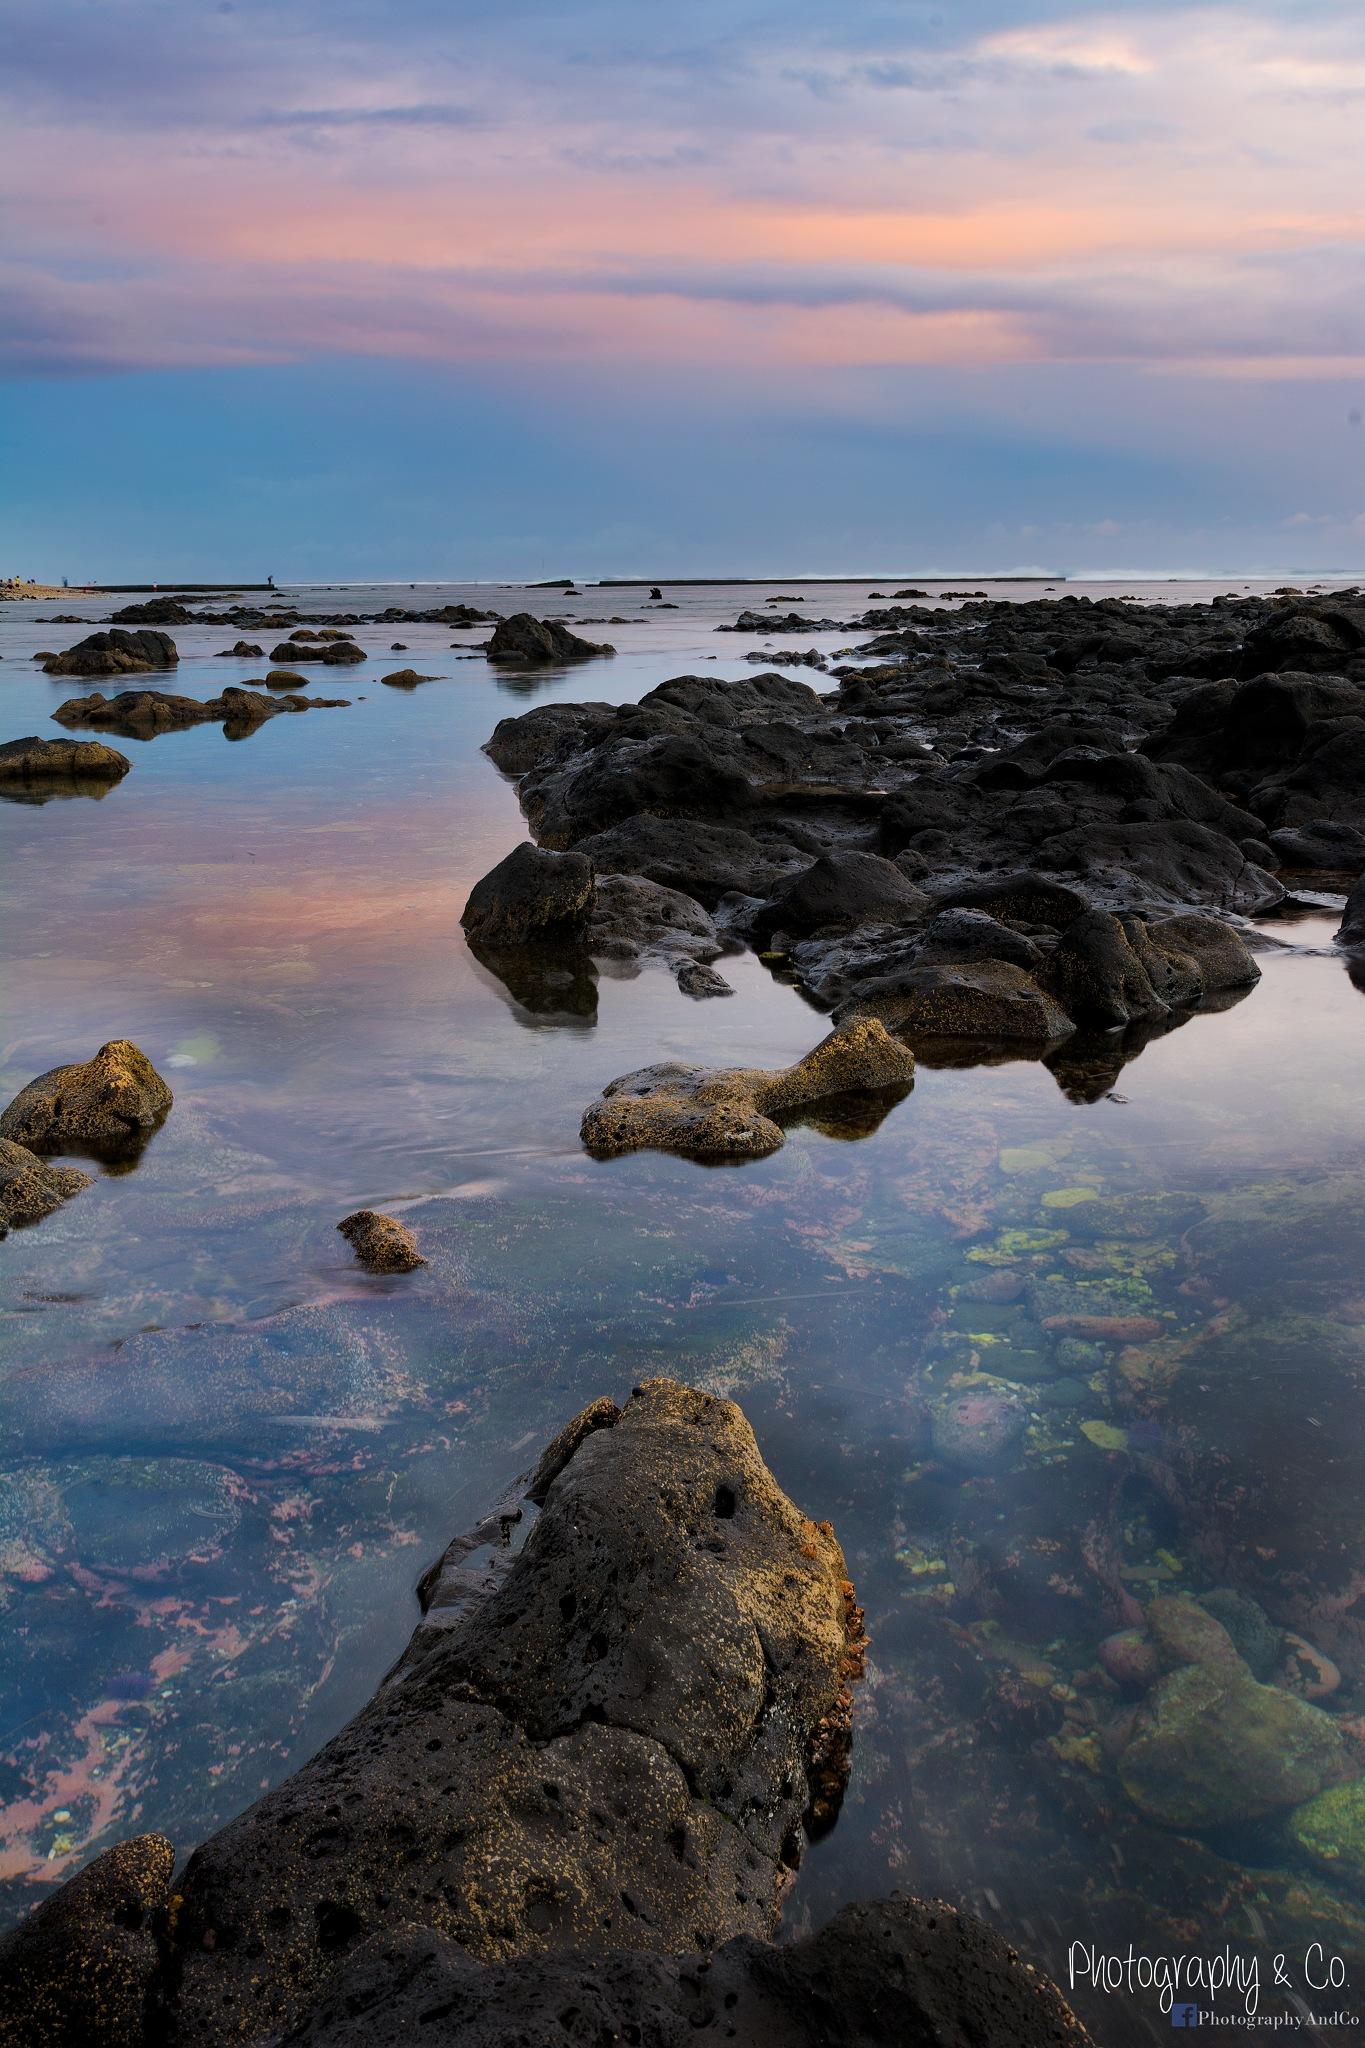 Sunset - Saint-Pierre by olivier.samcawfreve